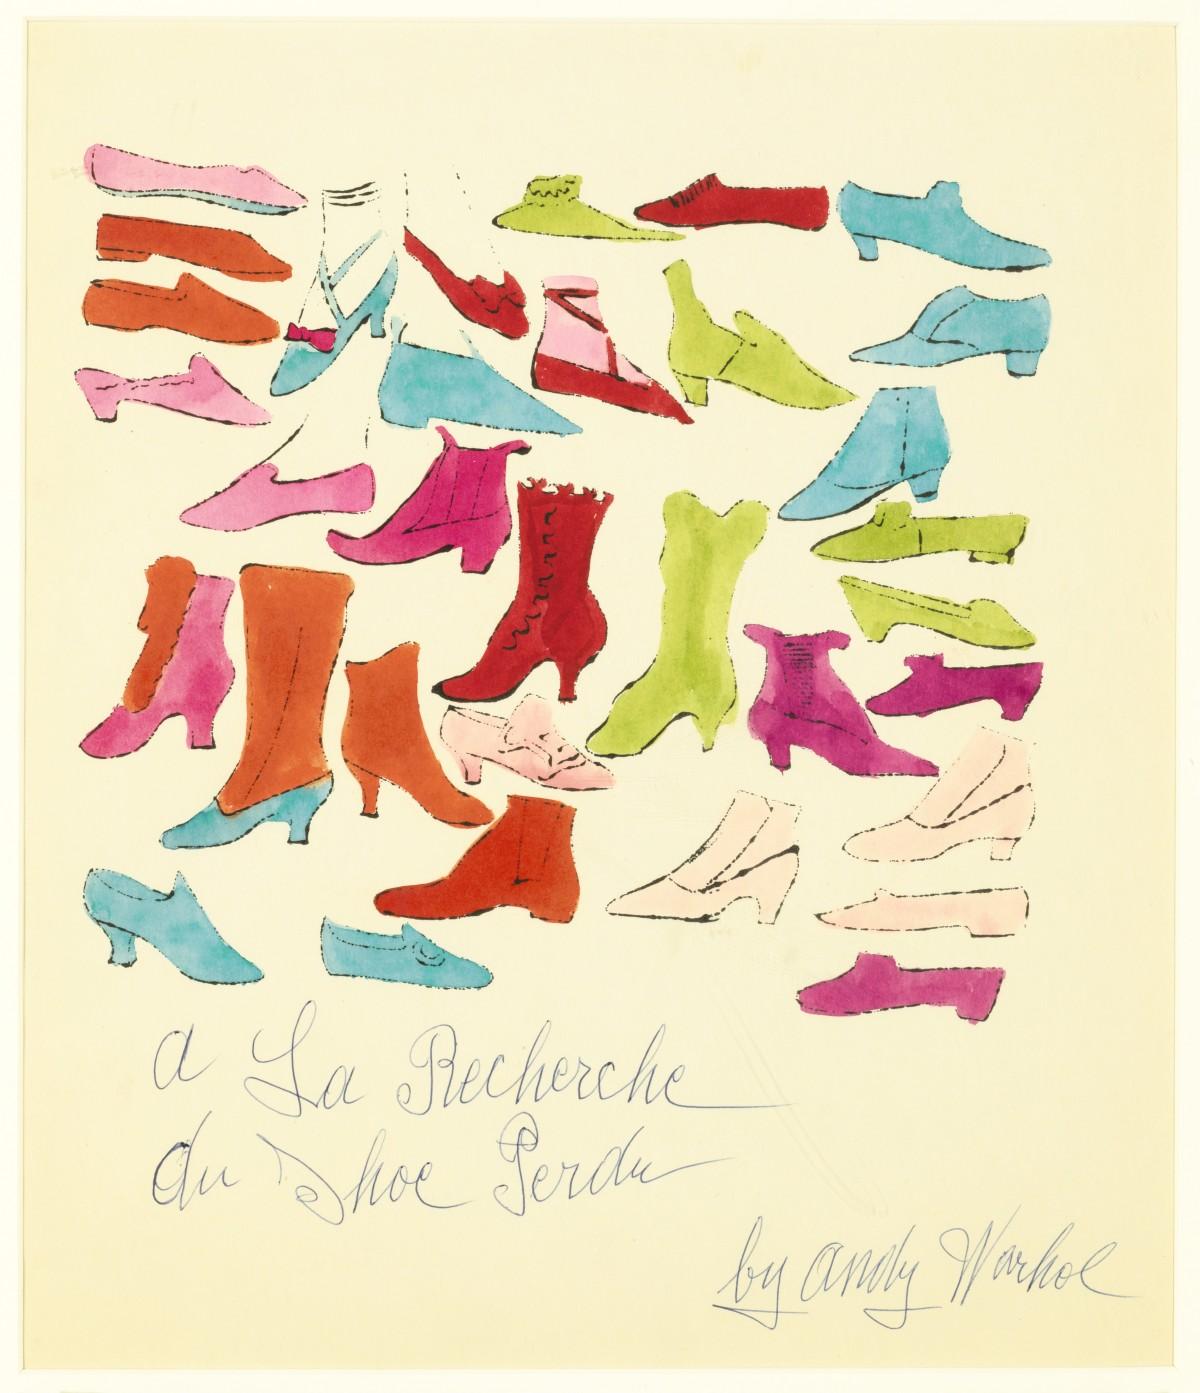 Andy Warhol's A La Recherche du Shoe Perdu.